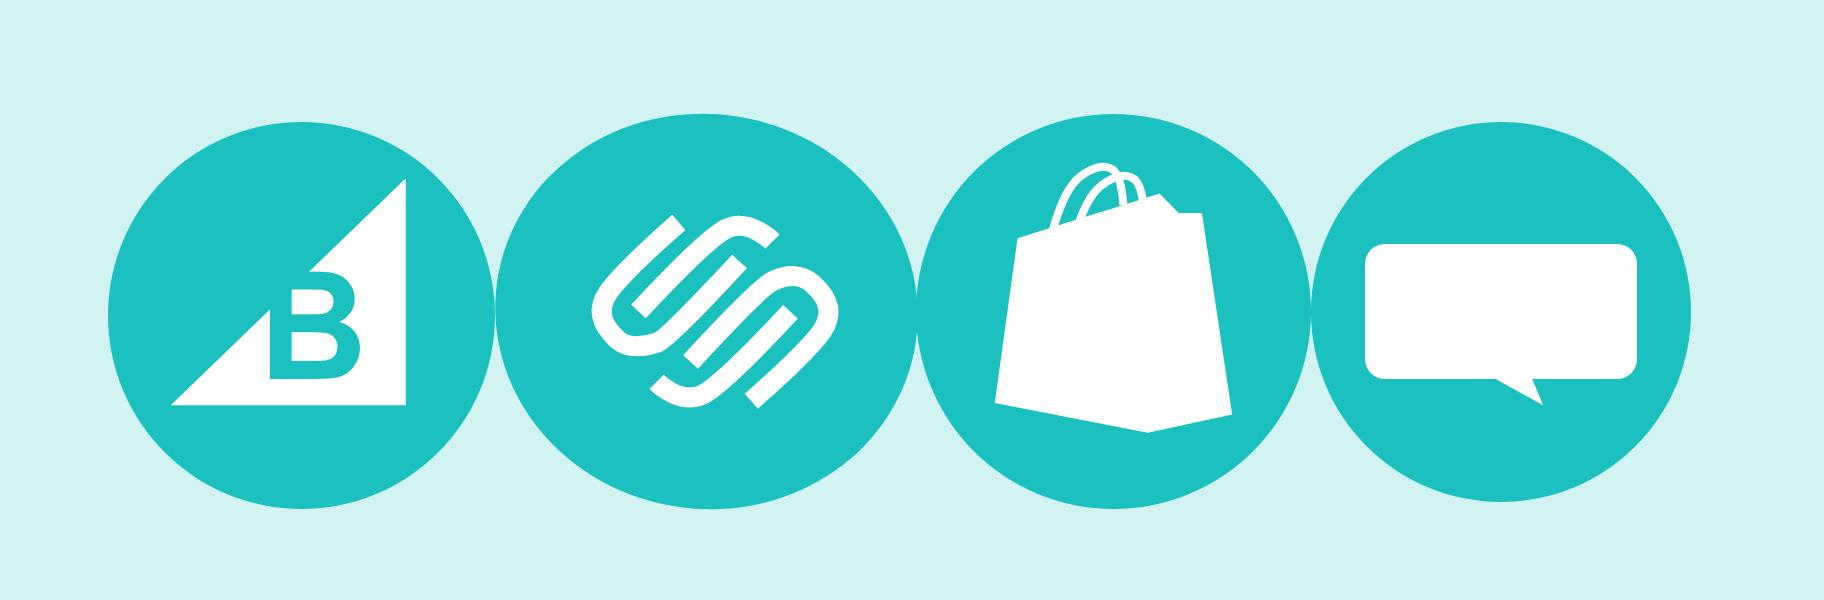 best ecommerce platform new store